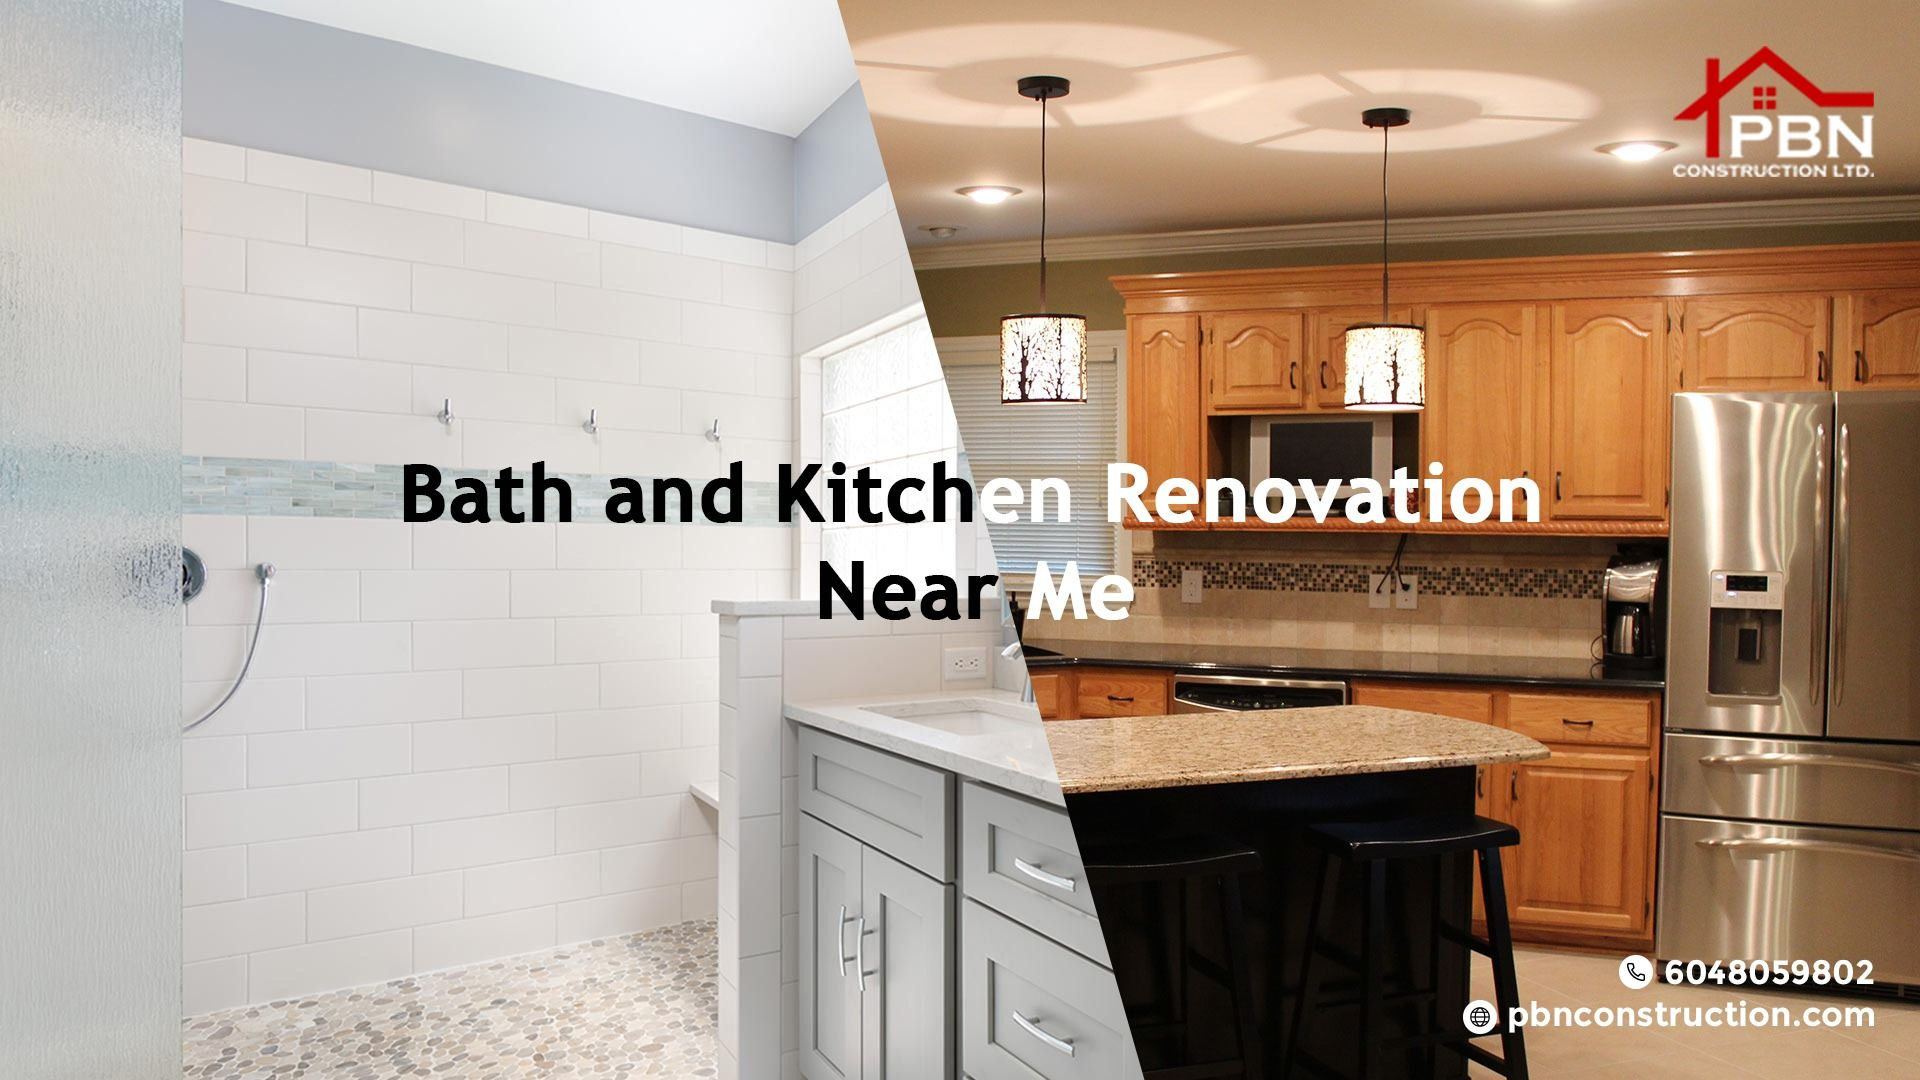 Kitchen And Bath Renovation Near Me Fireplaces Services Vancouver Kitchen Renovation Commercial Renovation Bath Renovation